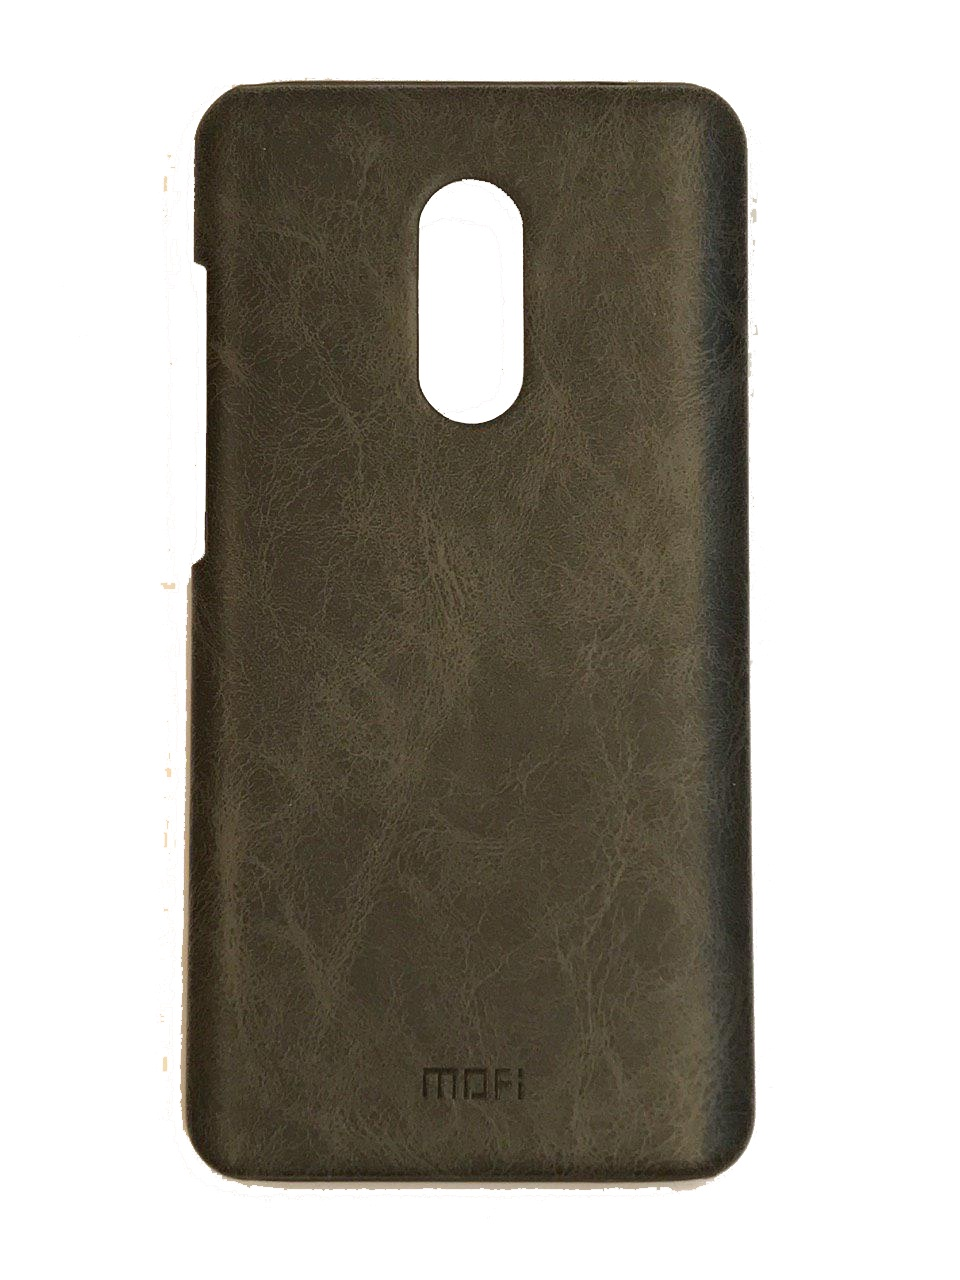 Чехол для сотового телефона Mofi Накладка Xiaomi Redmi 4A Dark Grey, темно-серый шорты для девочки kappa цвет темно серый 3032ne0 4a размер 140